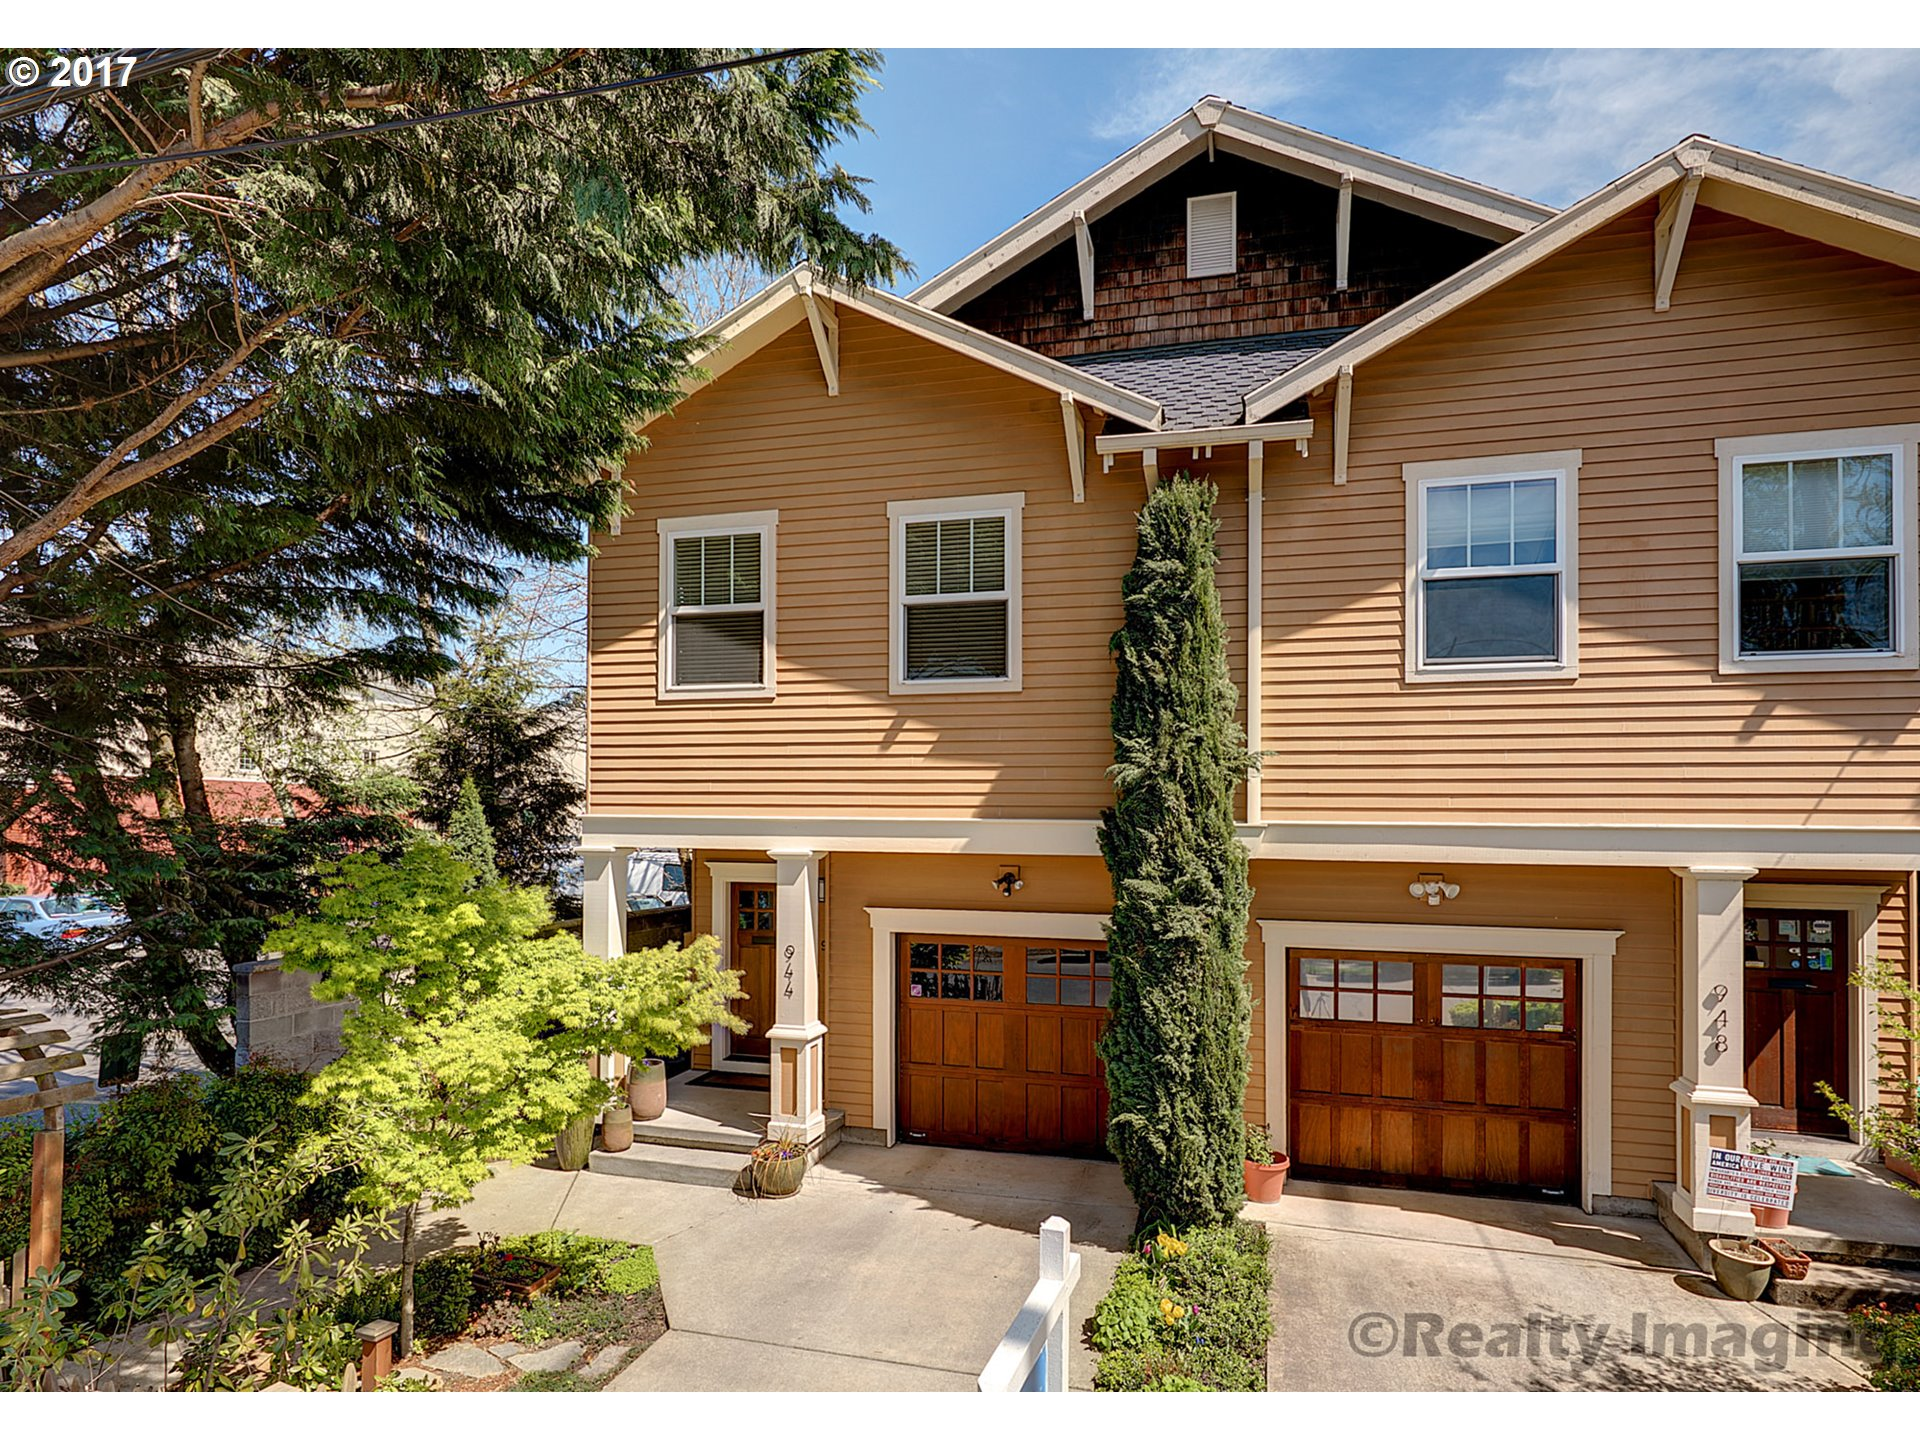 944 SE 45TH AVE, Portland, OR 97215